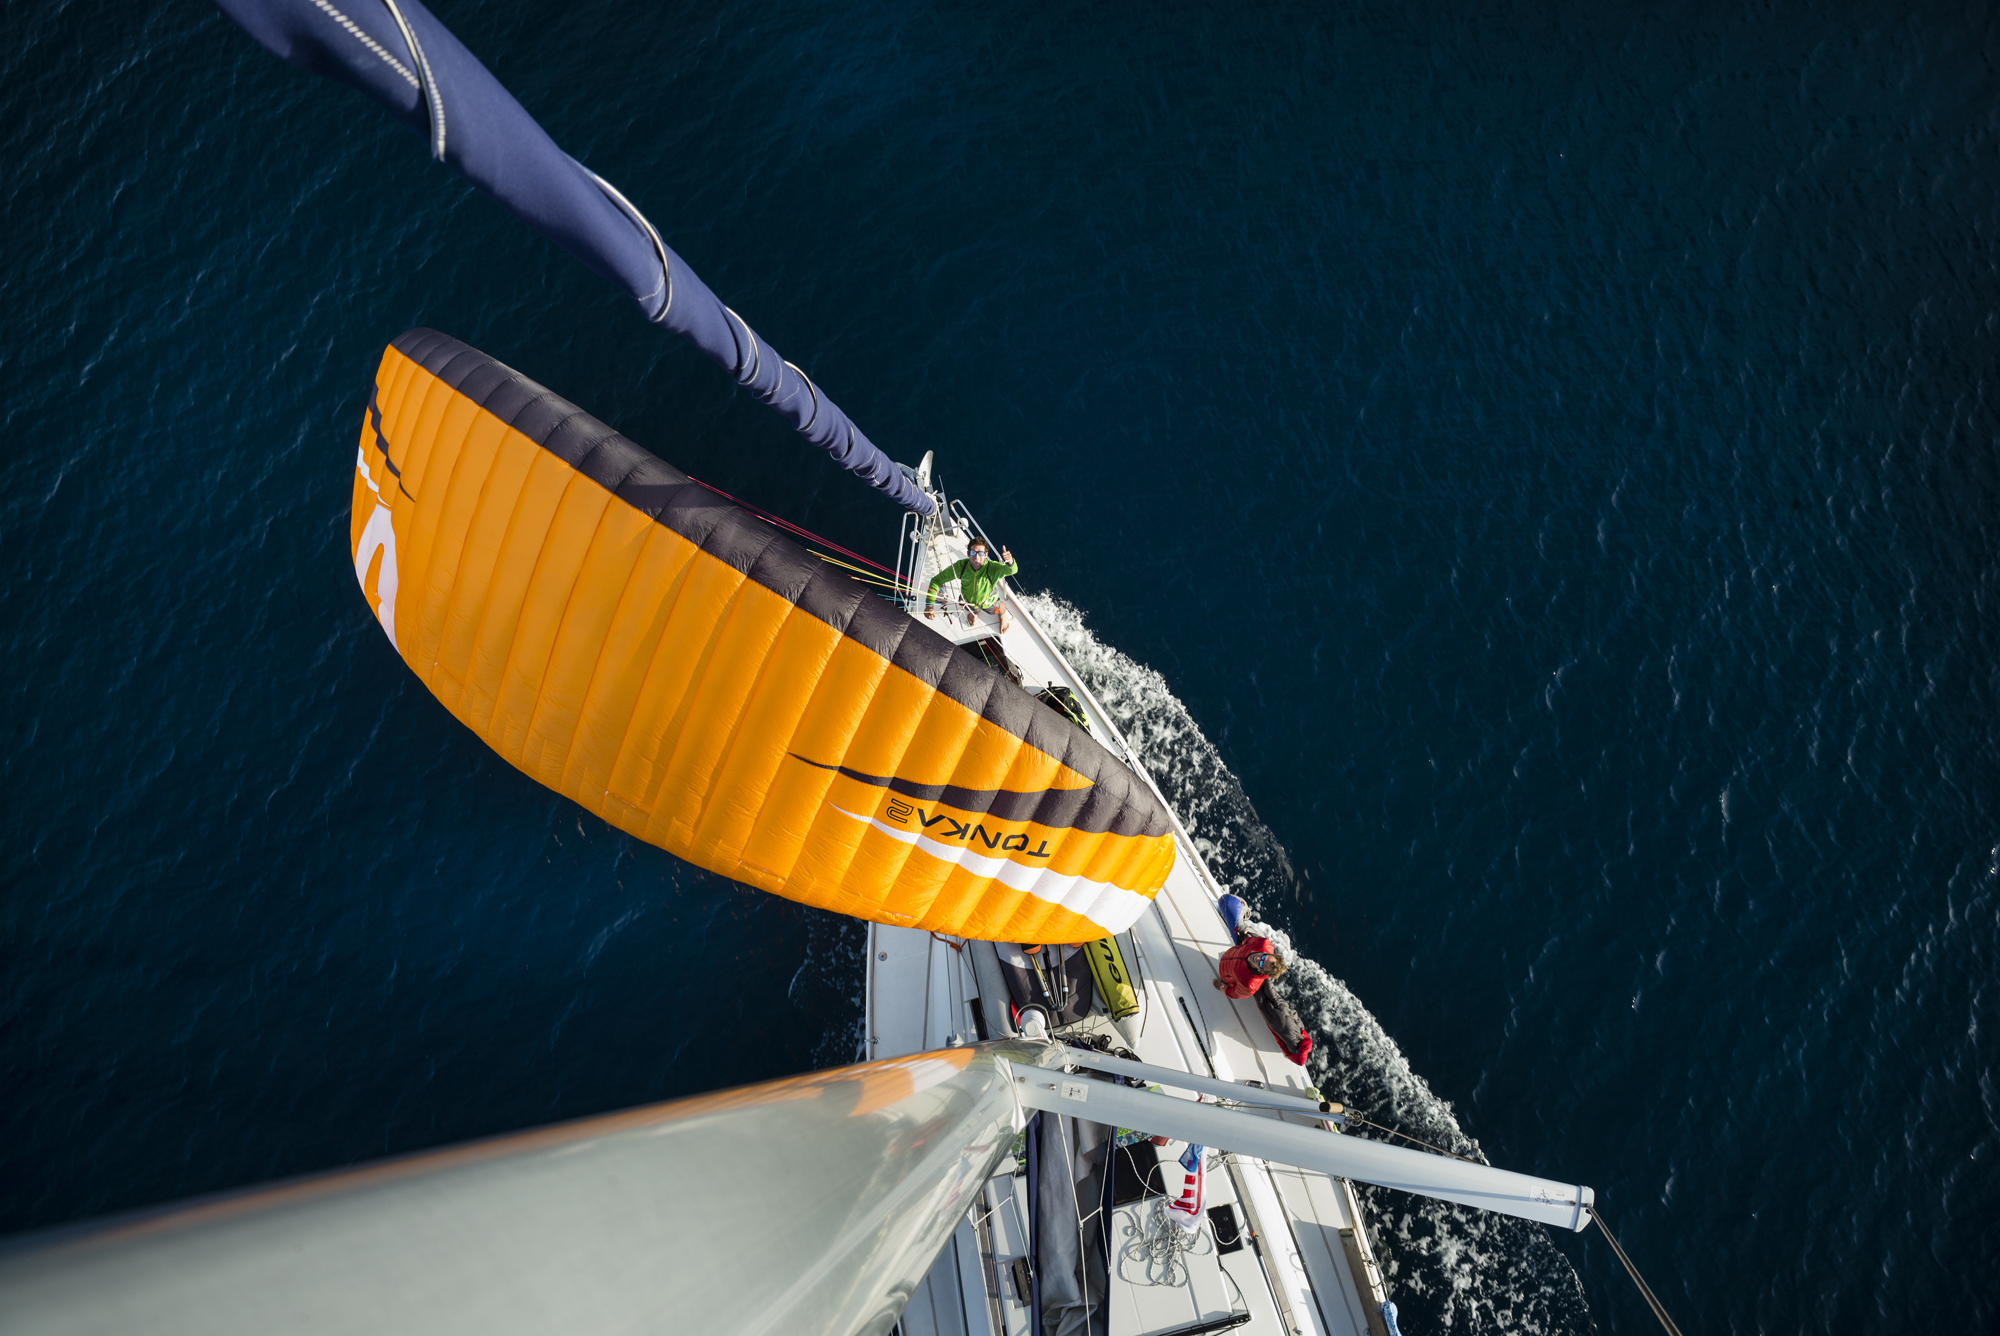 Croatie boat expe Francois ragolski groundhandling on a sailing boat paragliding Skywalk Tonka